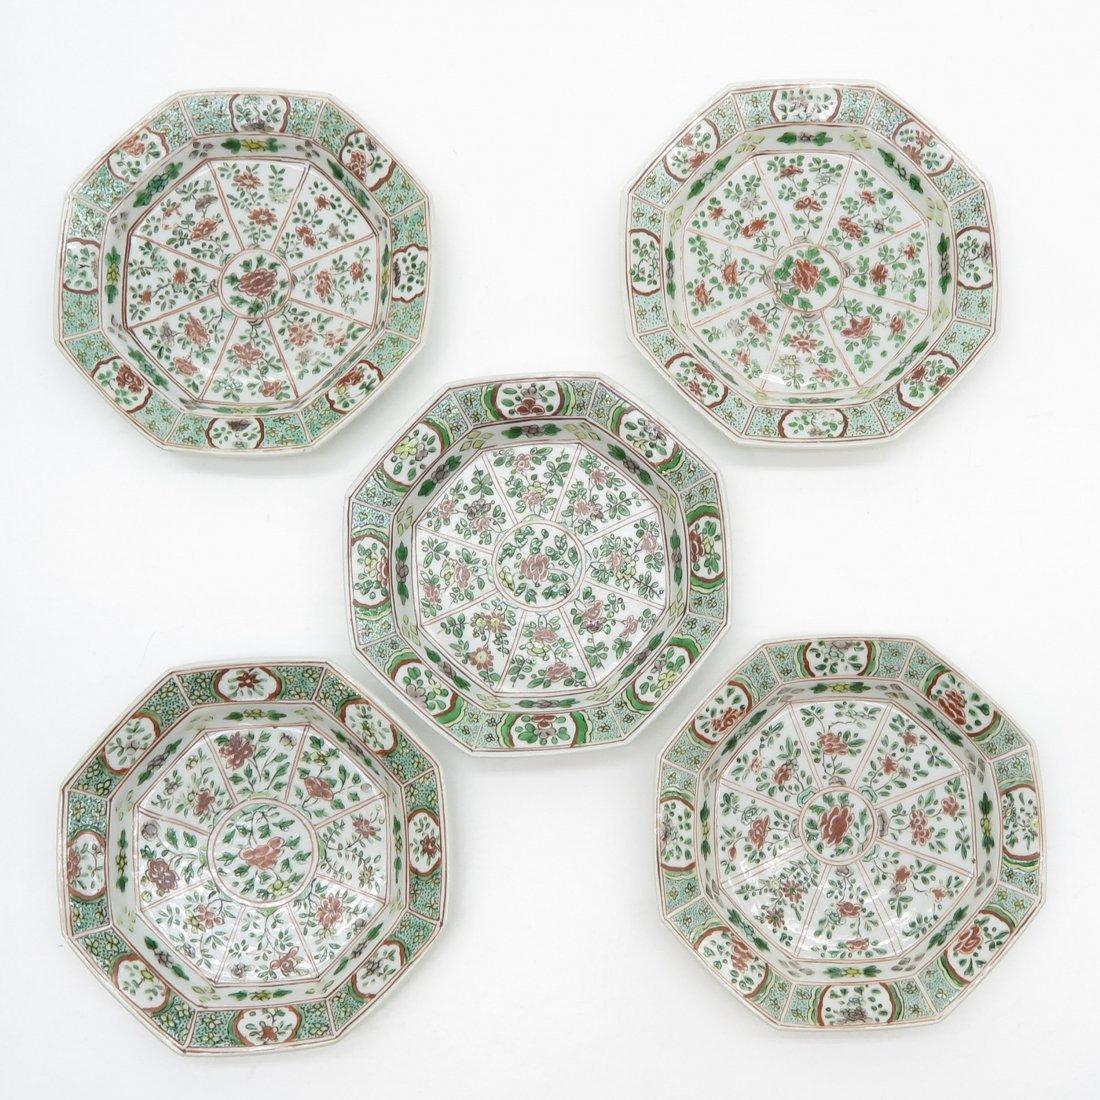 Lot of 5 Famille Verte China Porcelain Plates